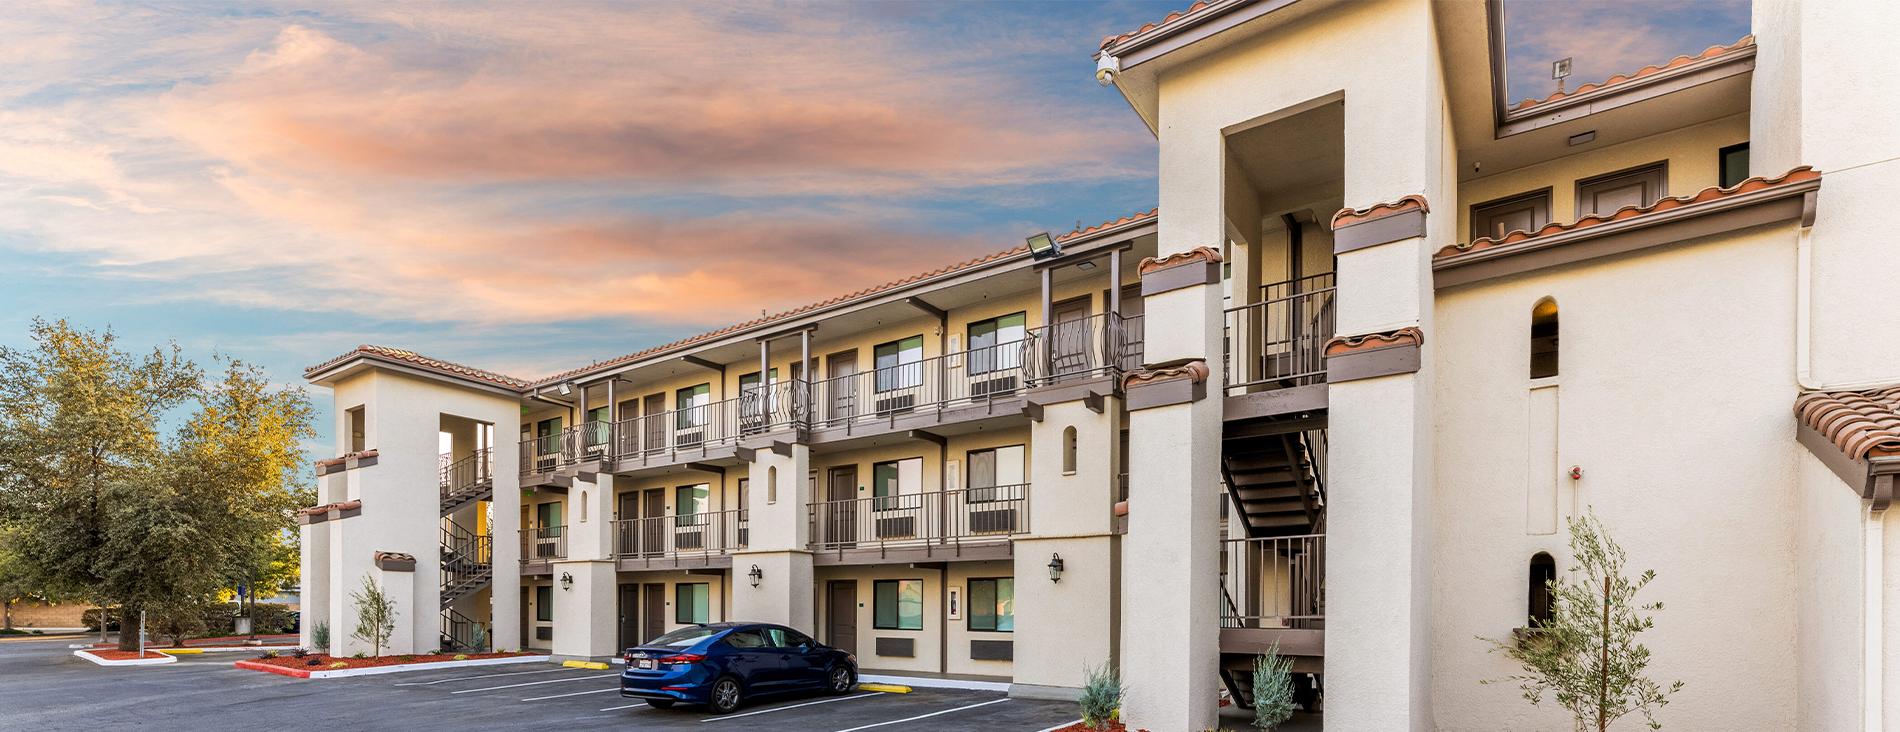 Hillstone Inn Tulare California